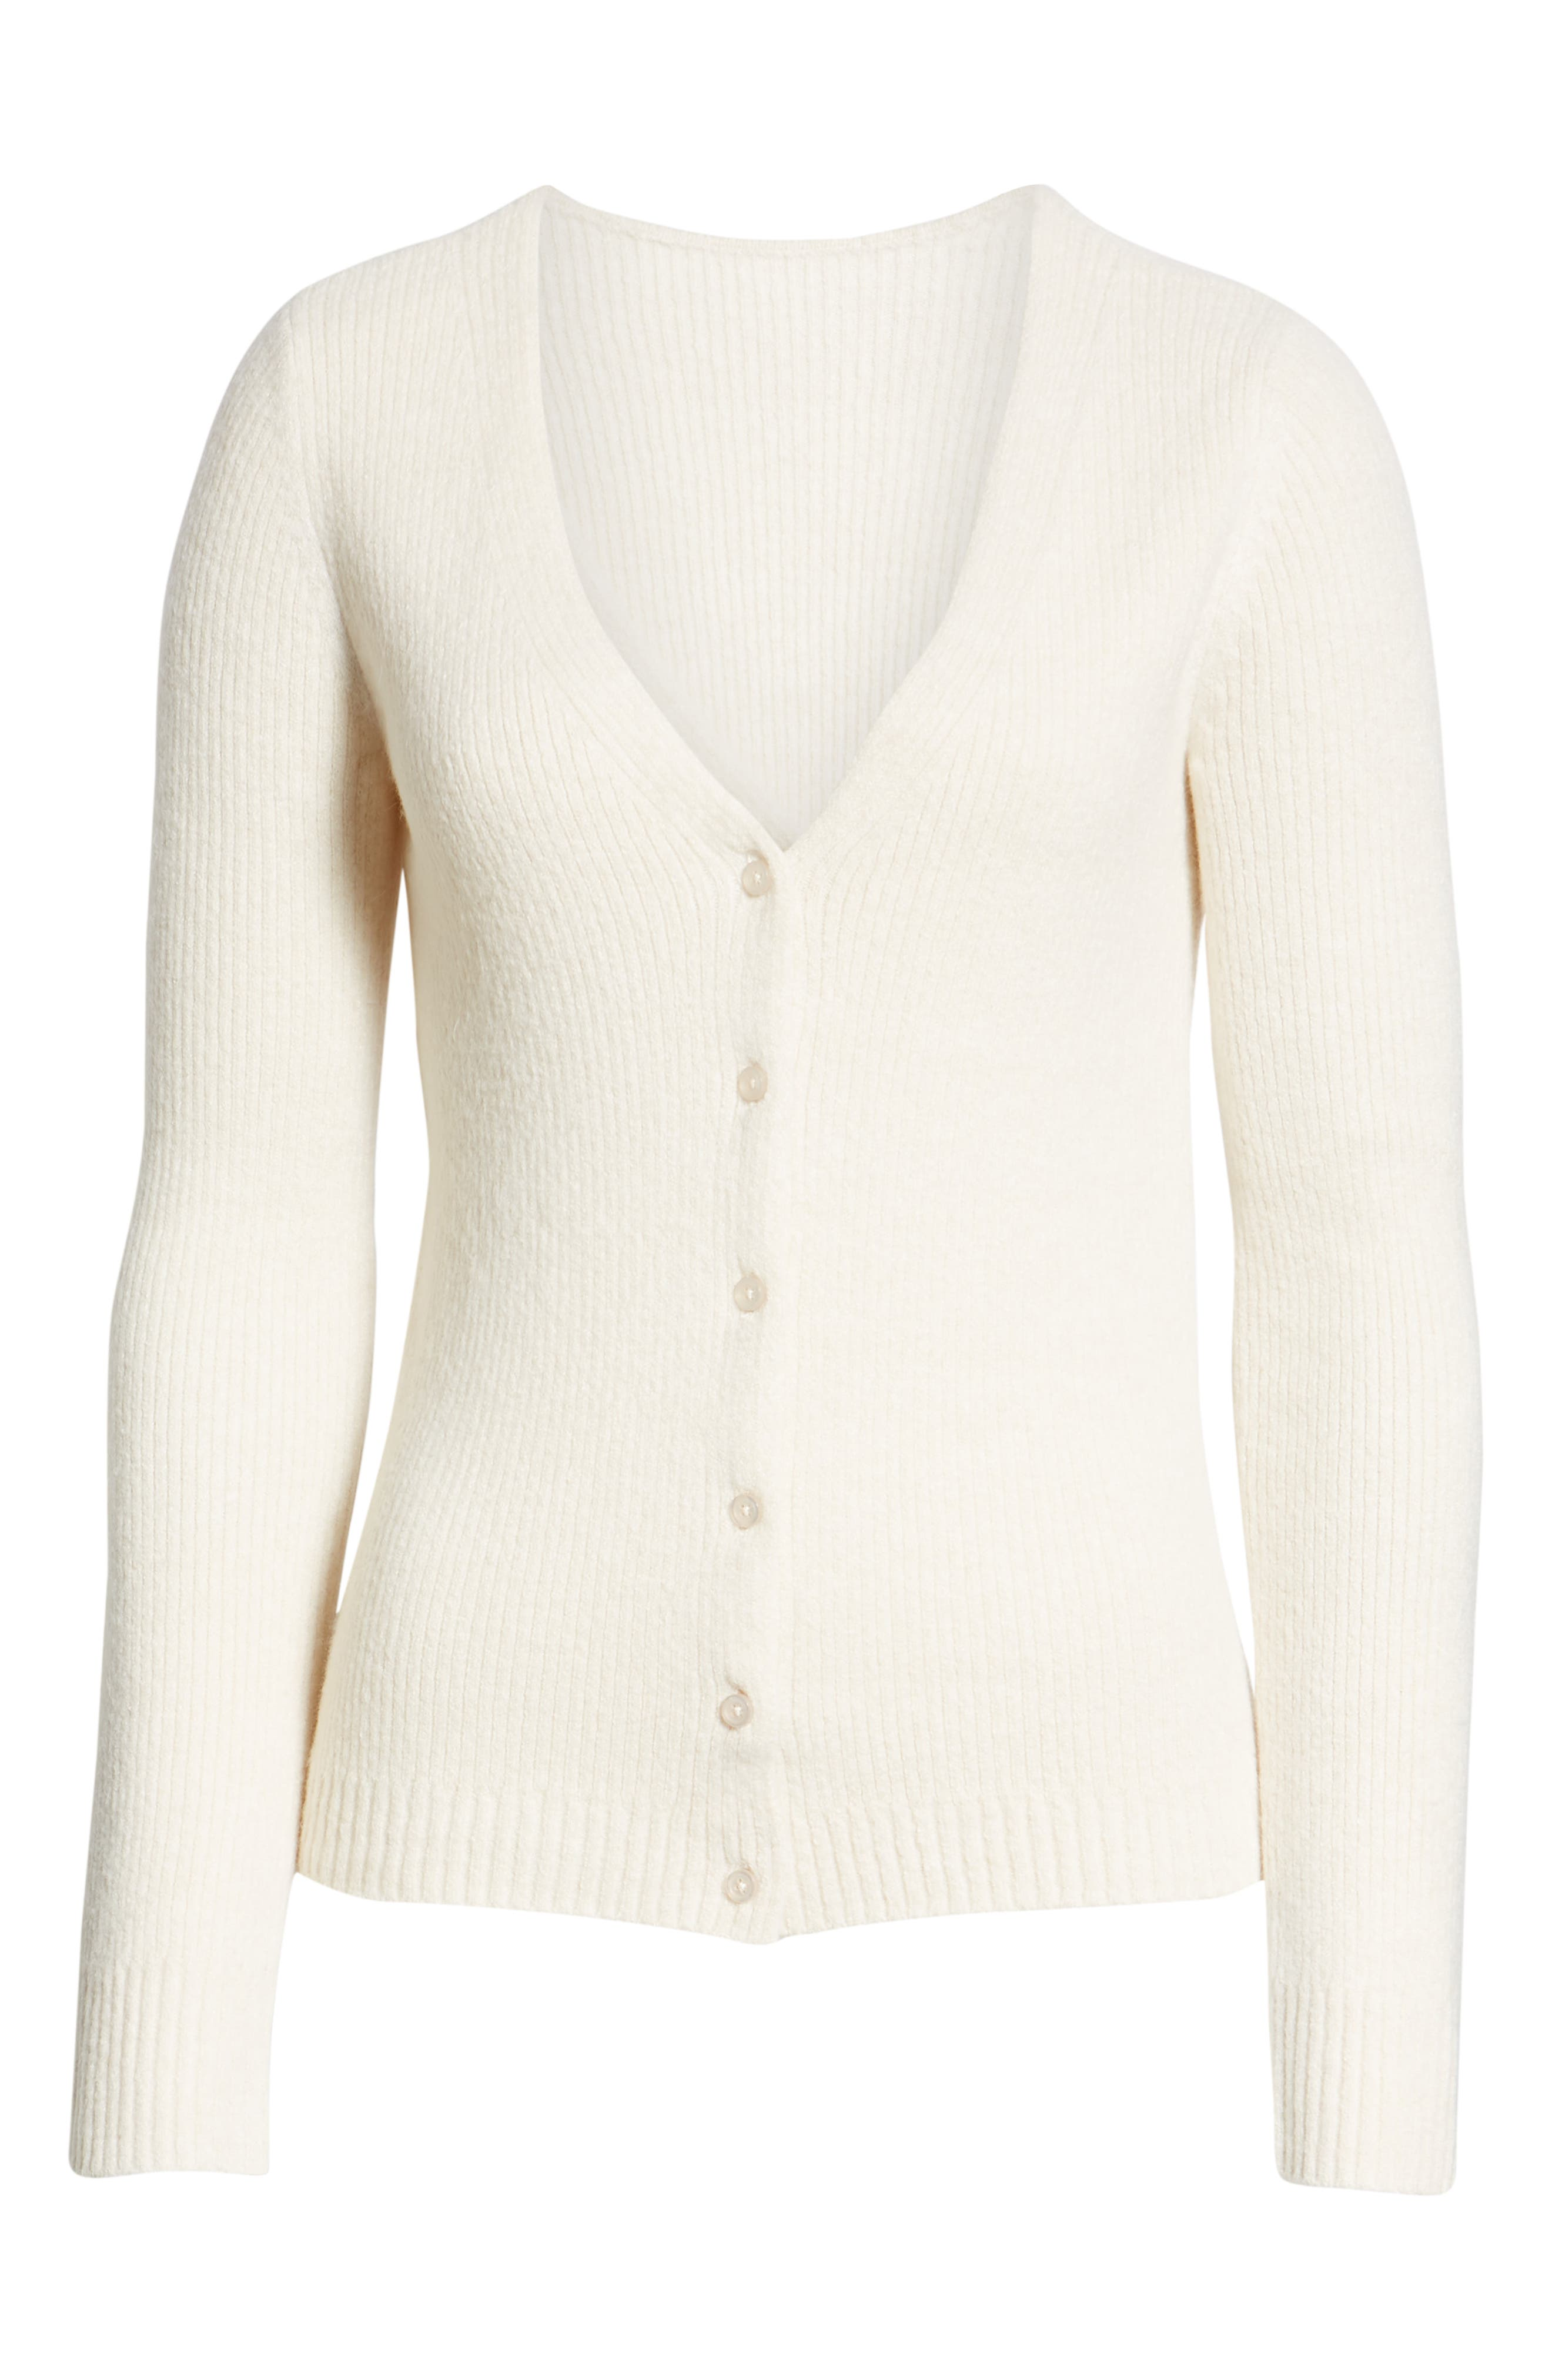 V-Neck Button Front Cardigan,                             Alternate thumbnail 6, color,                             BEIGE OATMEAL LIGHT HEATHER